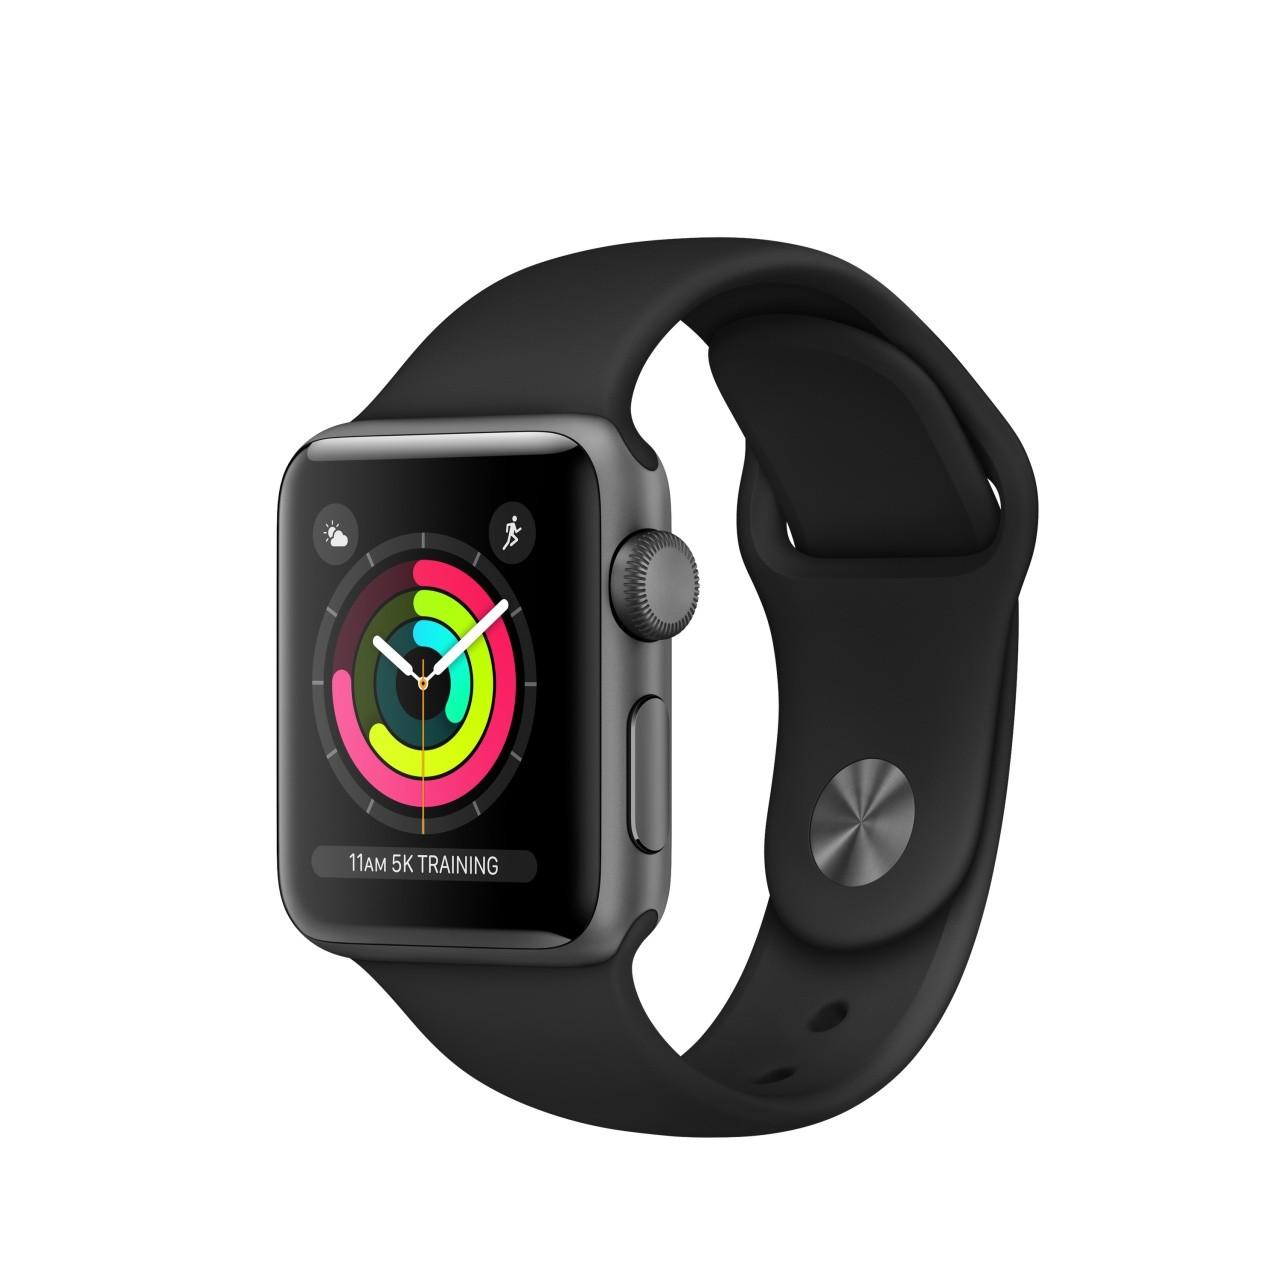 Apple Watch Series 3 Grigio GPS (satellitare)